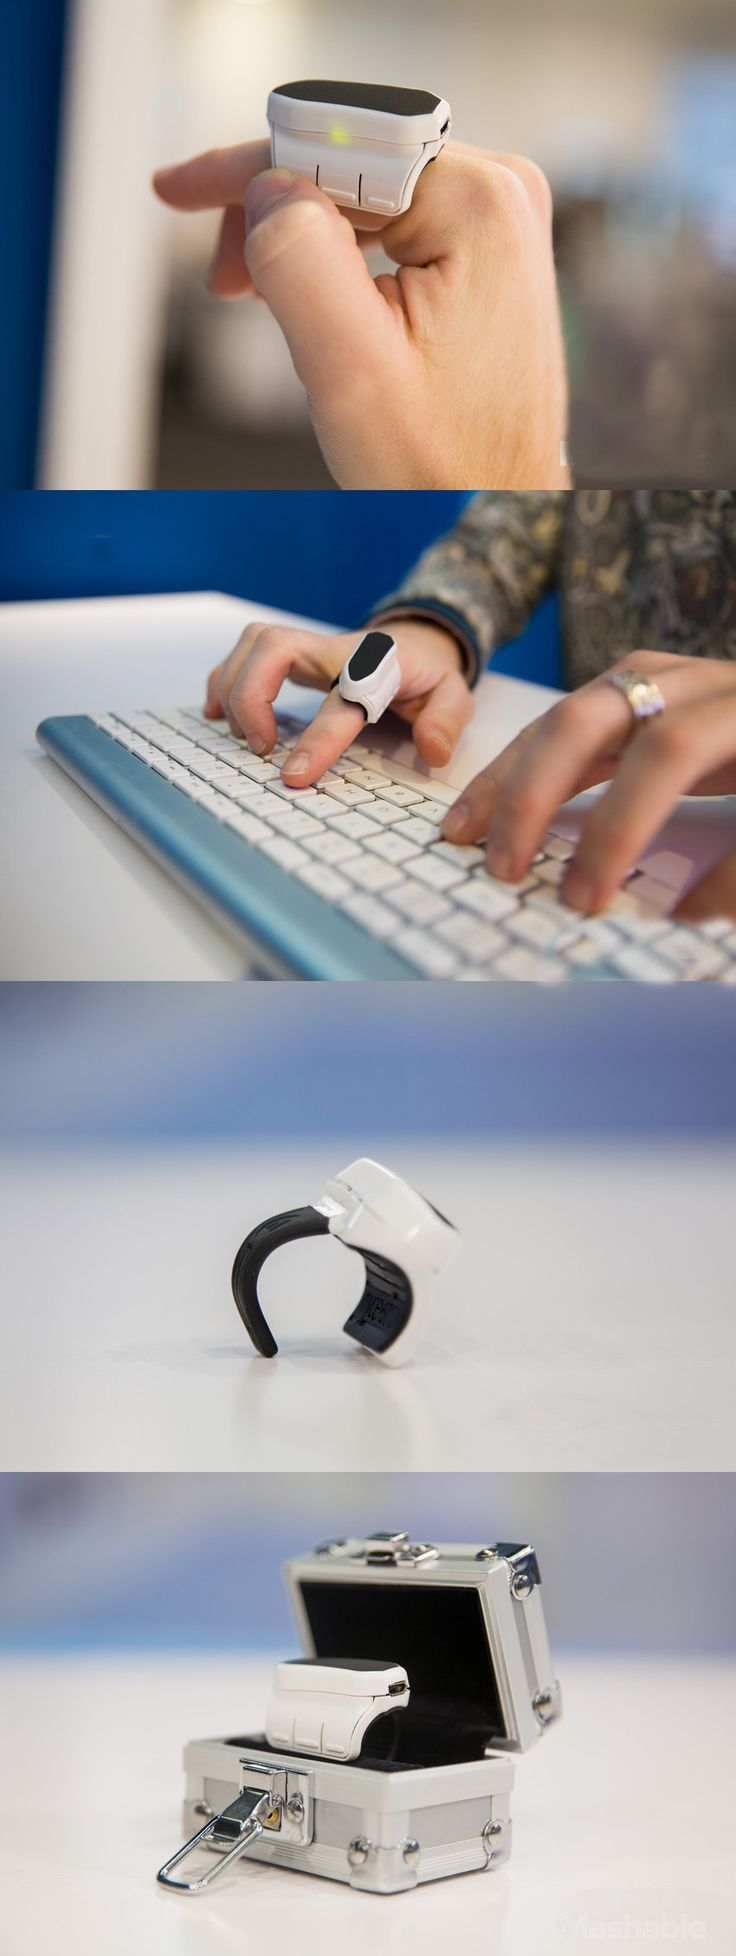 finger mouse.